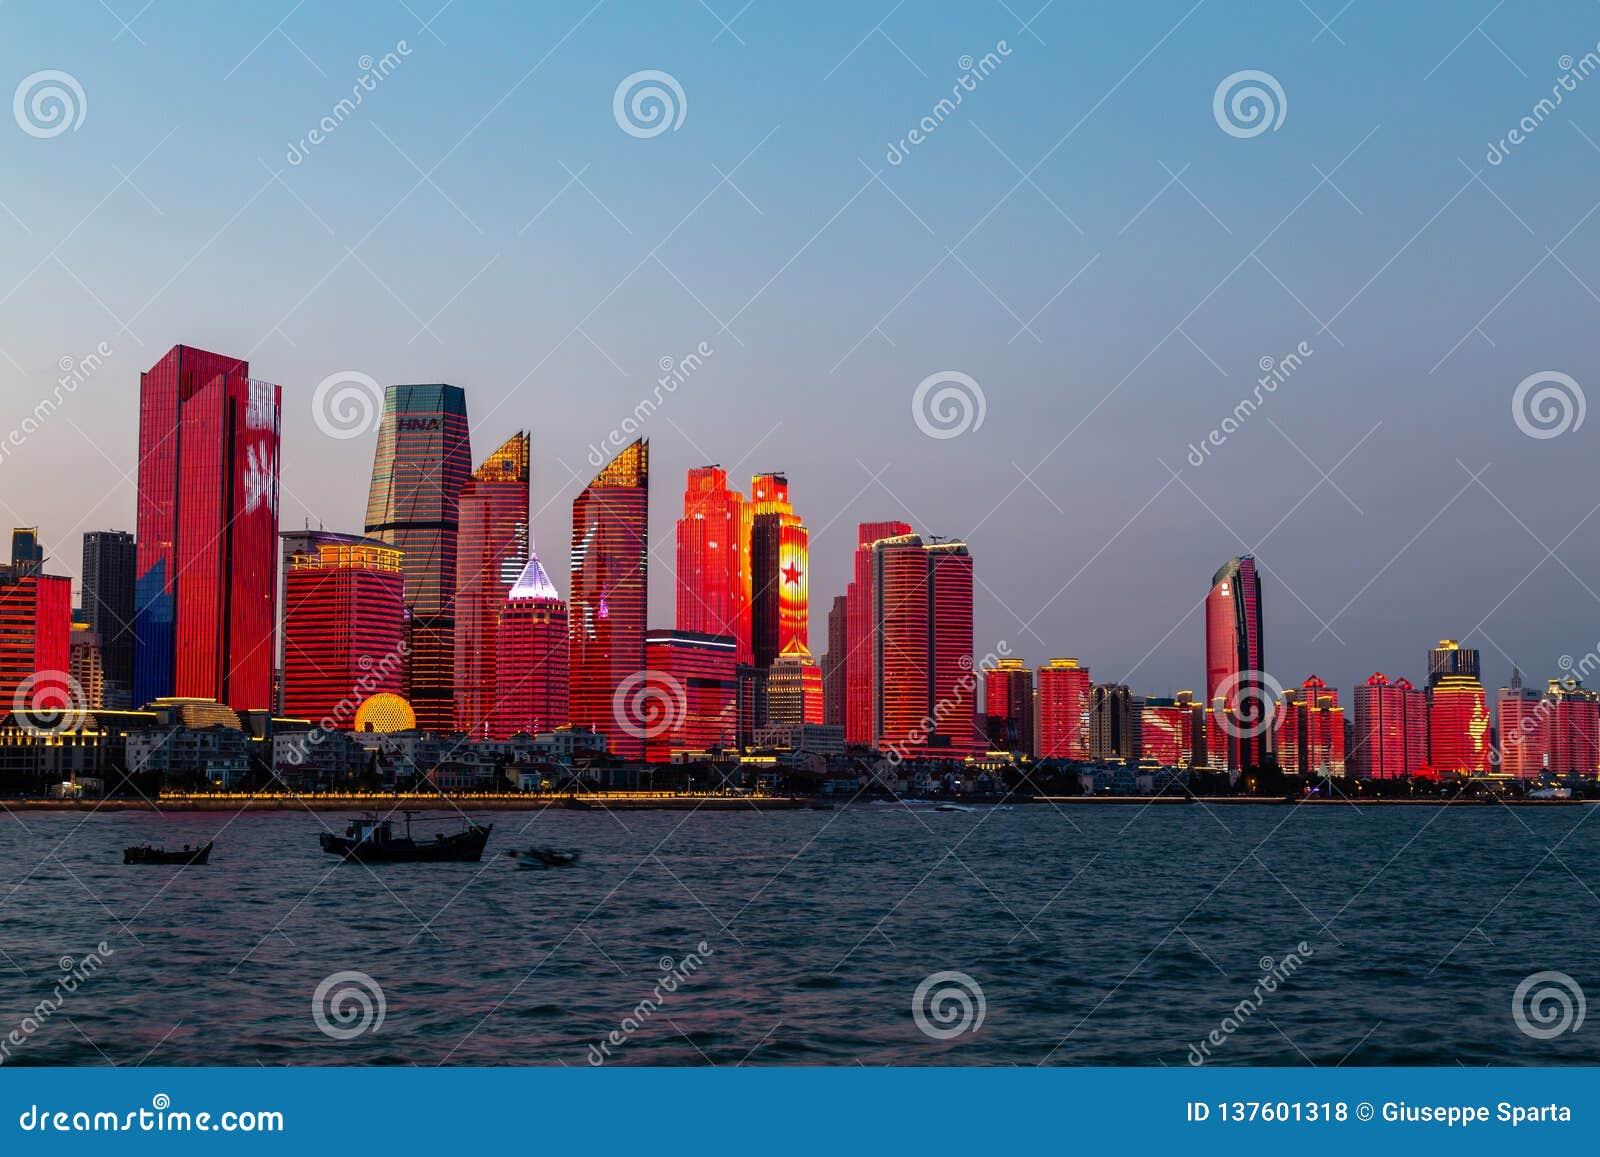 July 2018 - Qingdao, China - The new lightshow of Qingdao skyline created for the SCO summit